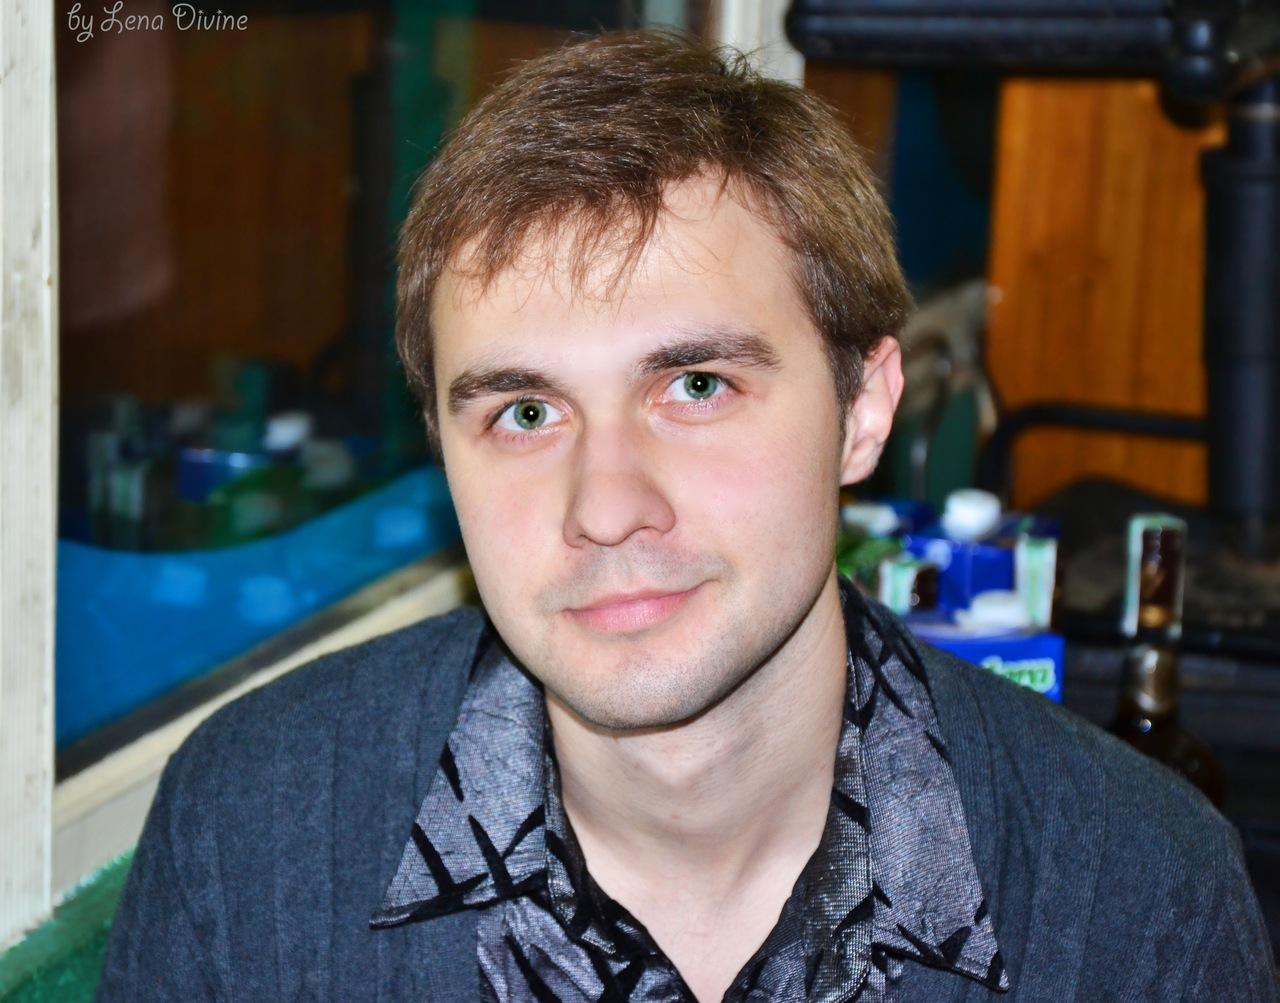 Дмитрий Тымчук, Киев - фото №7